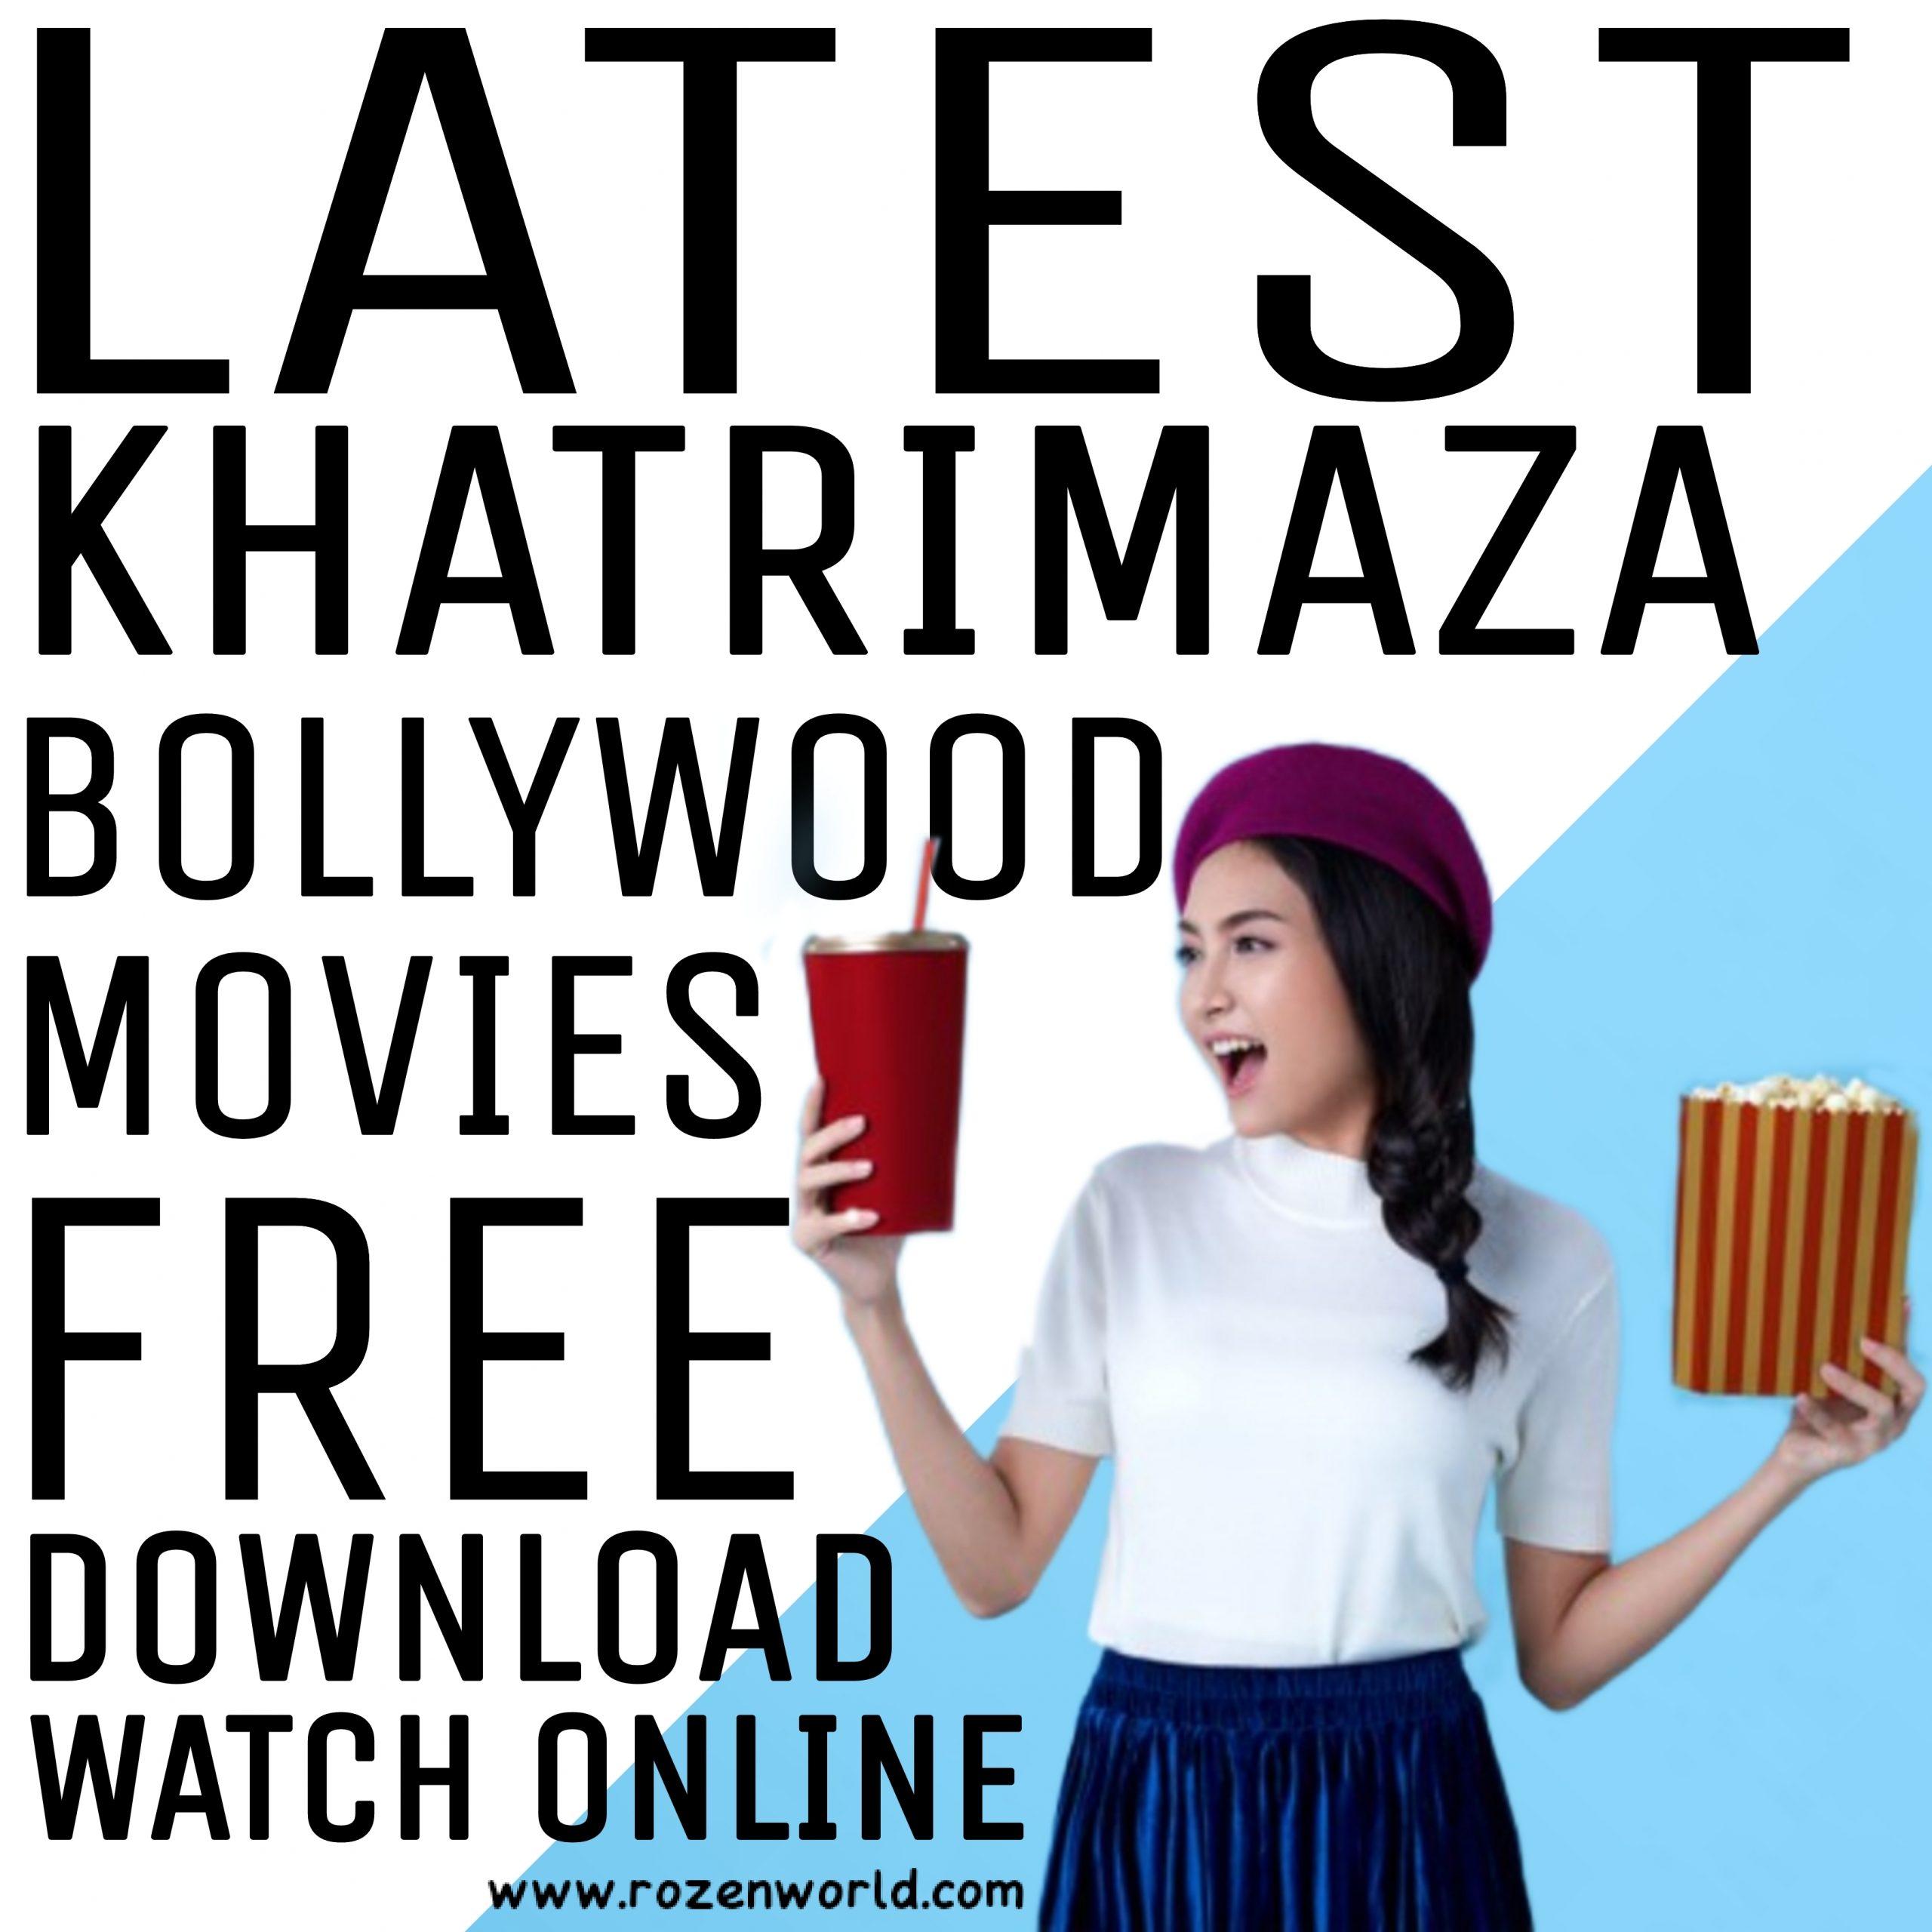 Latest khatrimaza Bollywood Movies